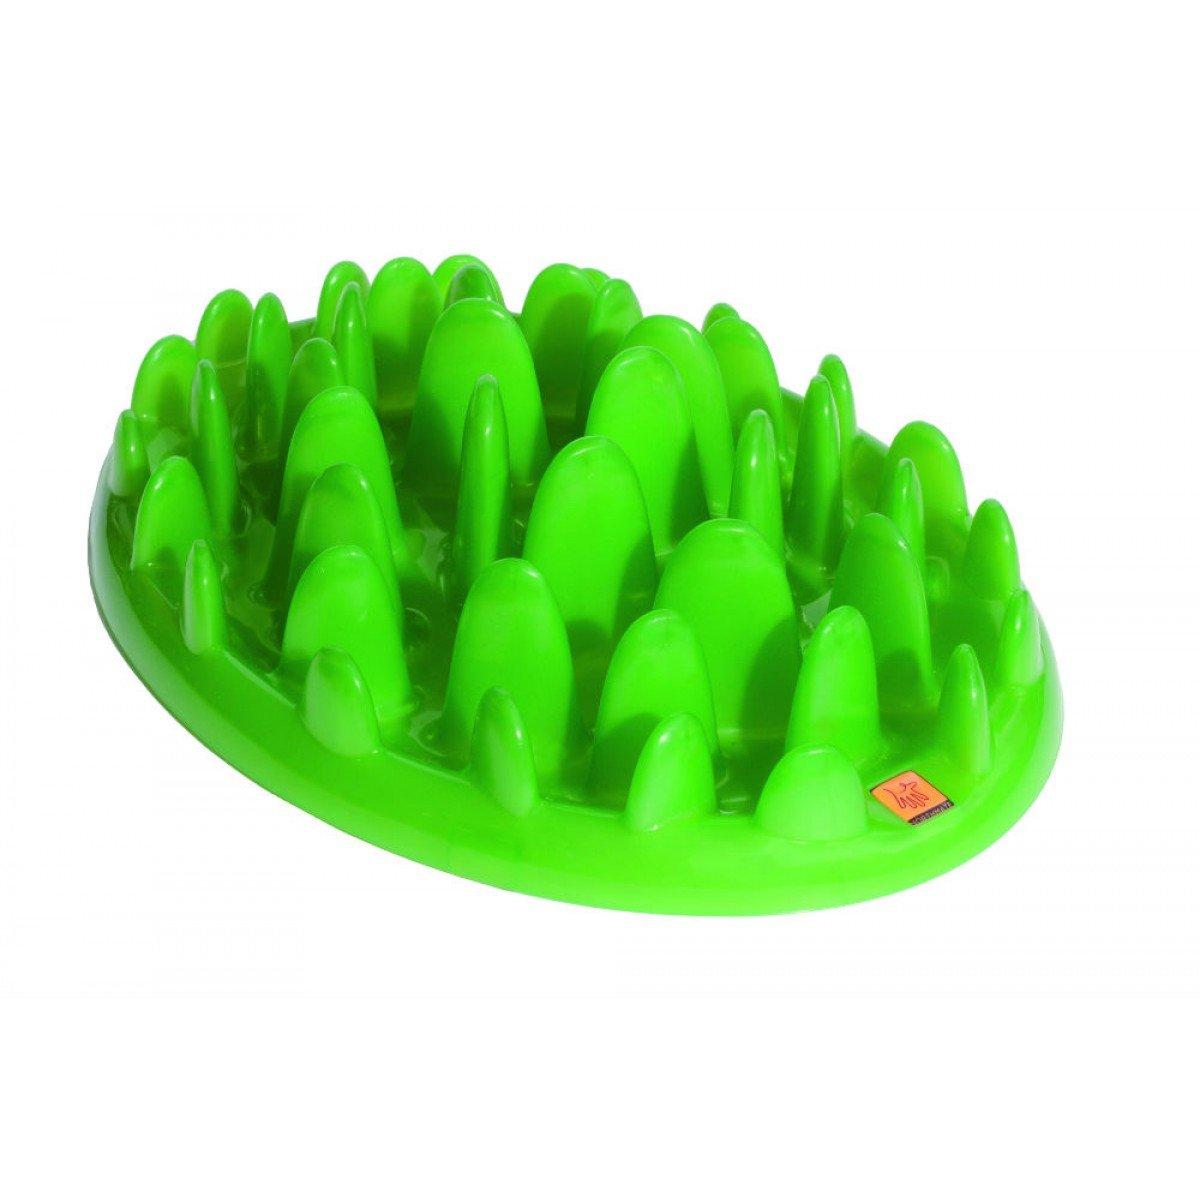 The Company of Animals - Northmate Interactive Feeder - Slow Feed Dog Bowl - Mini, Green